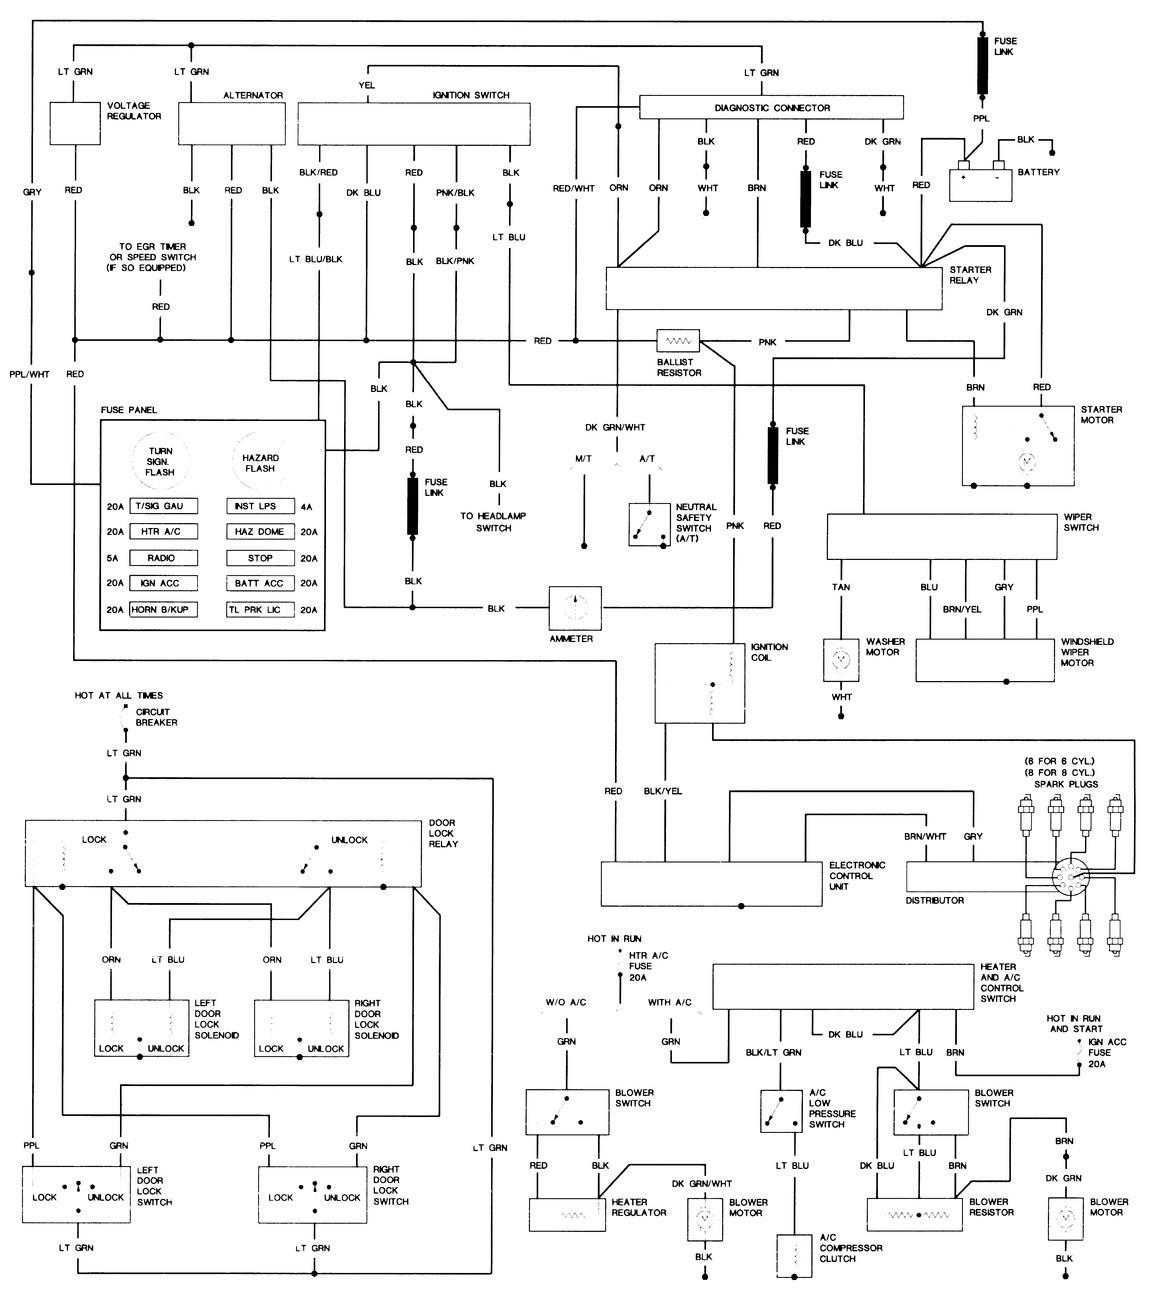 2016 dodge dart stereo wiring diagram ranger boat ford 8n distributor fuse box